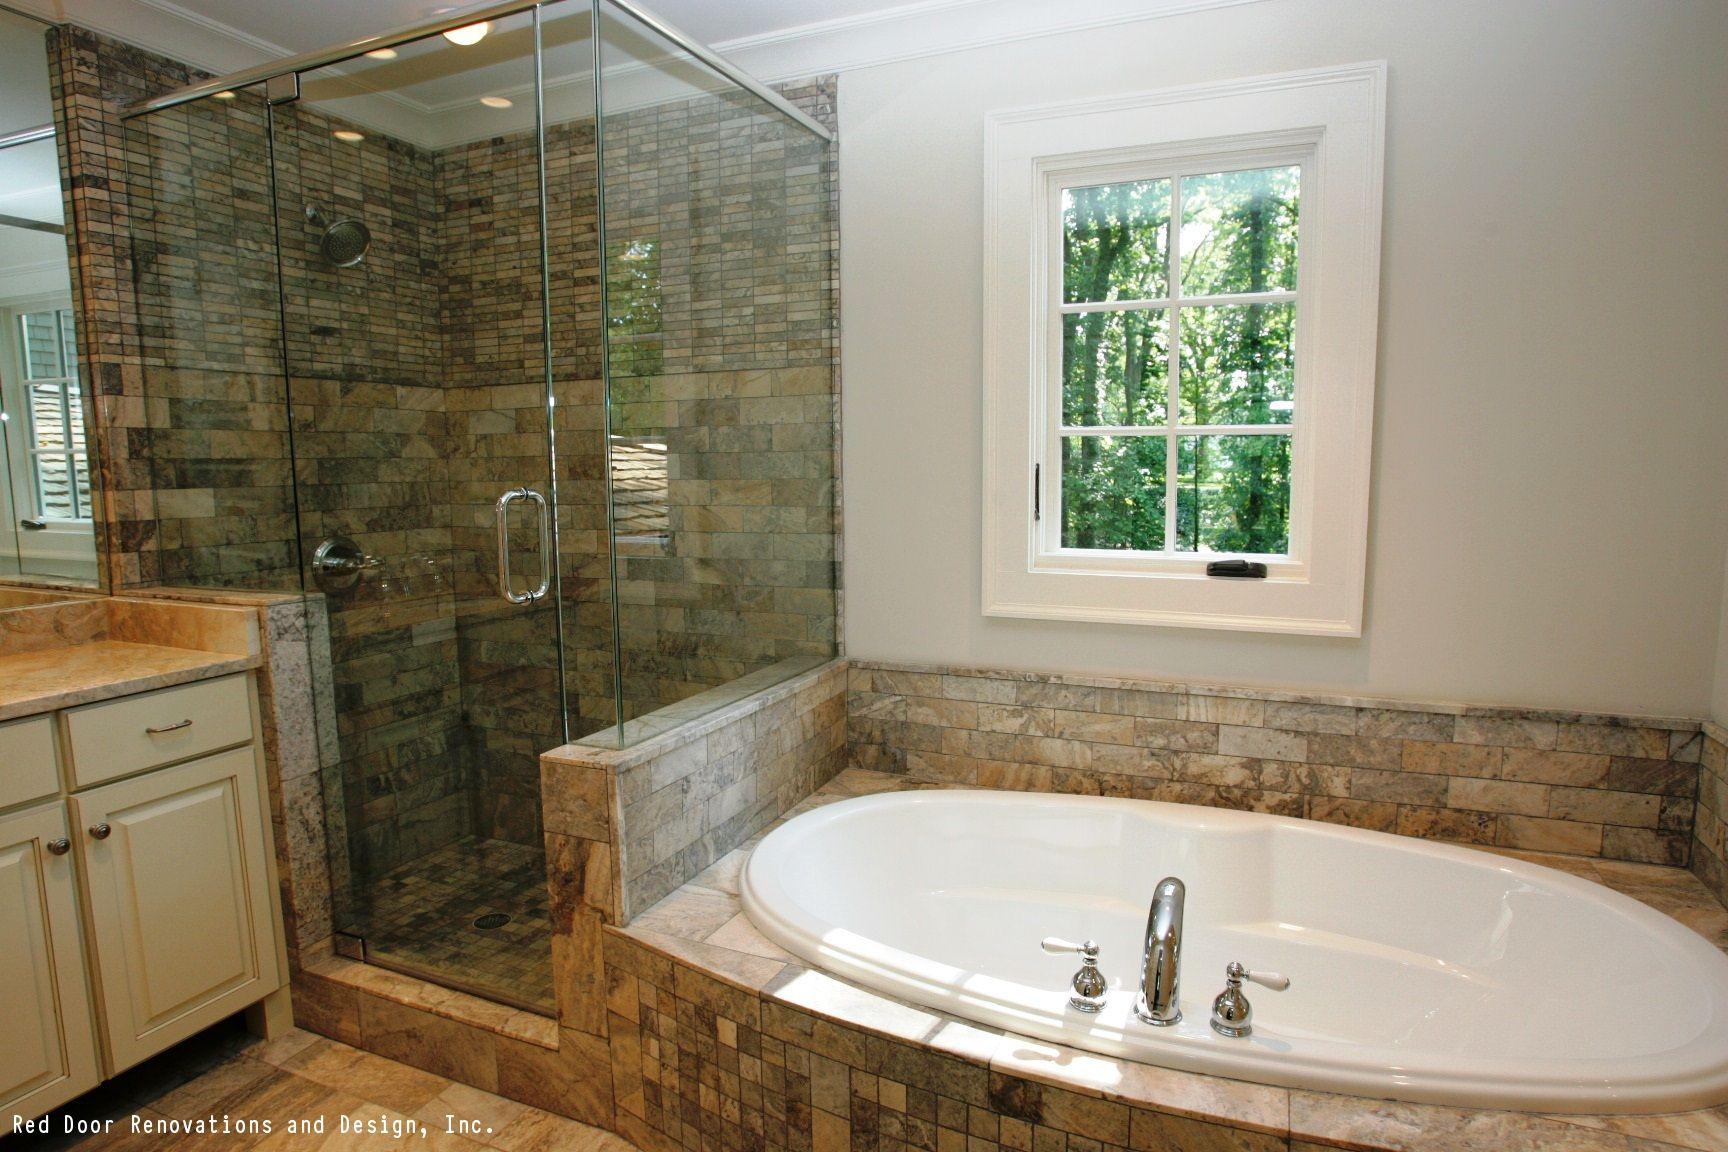 Stone Backsplash Costs Installation Types Grades Stone Backsplash Master Bathroom Decor Rustic Bathroom Designs